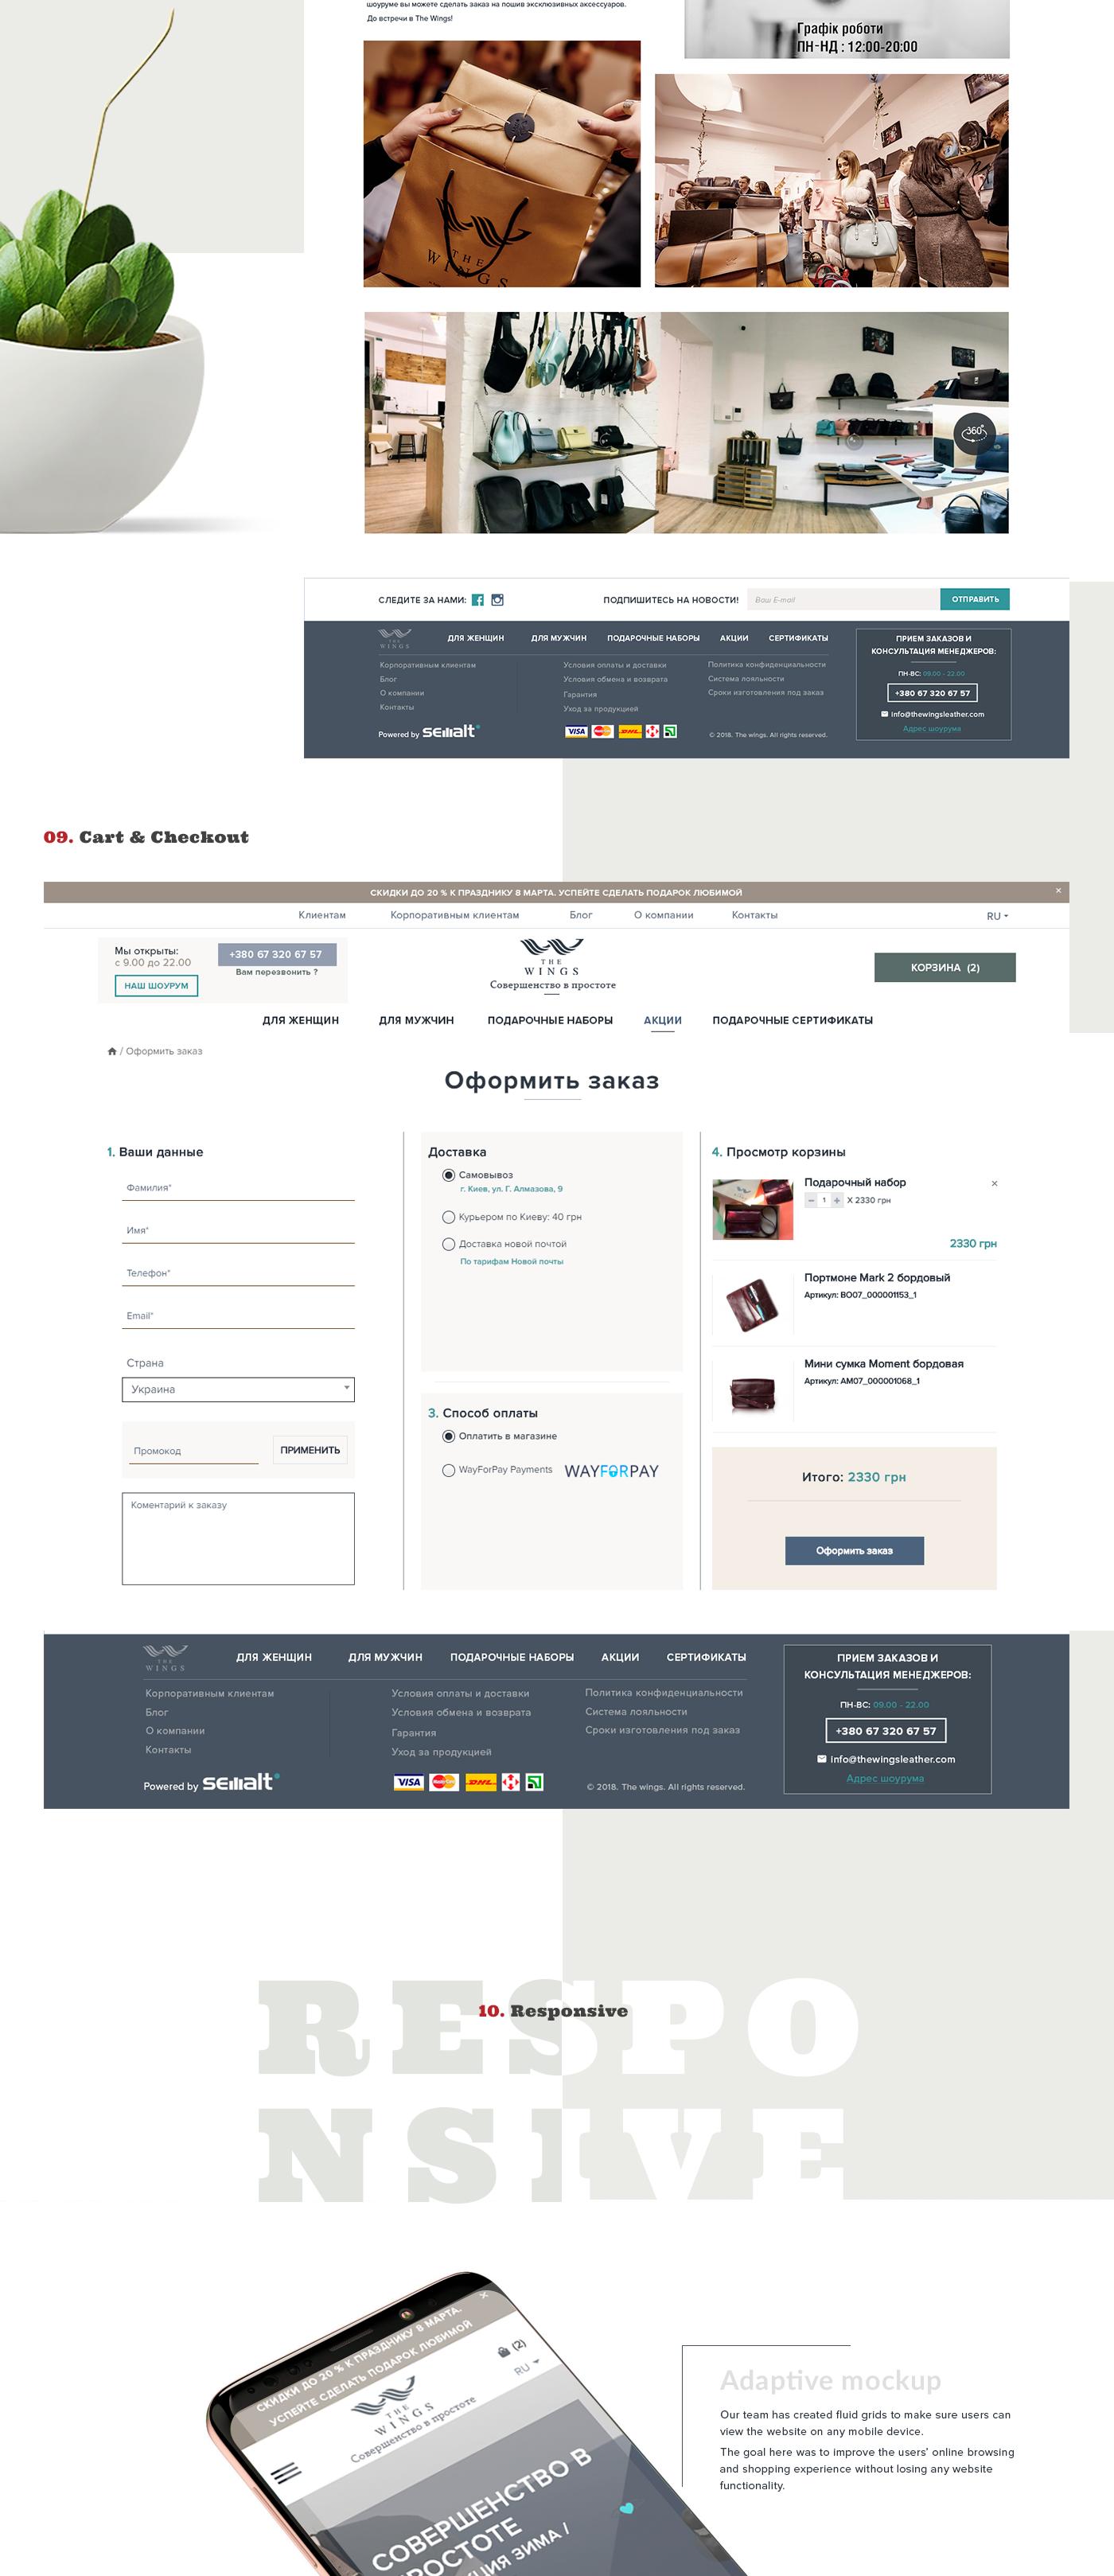 ux UI e-commerce bags brand wings interaction reward awwward